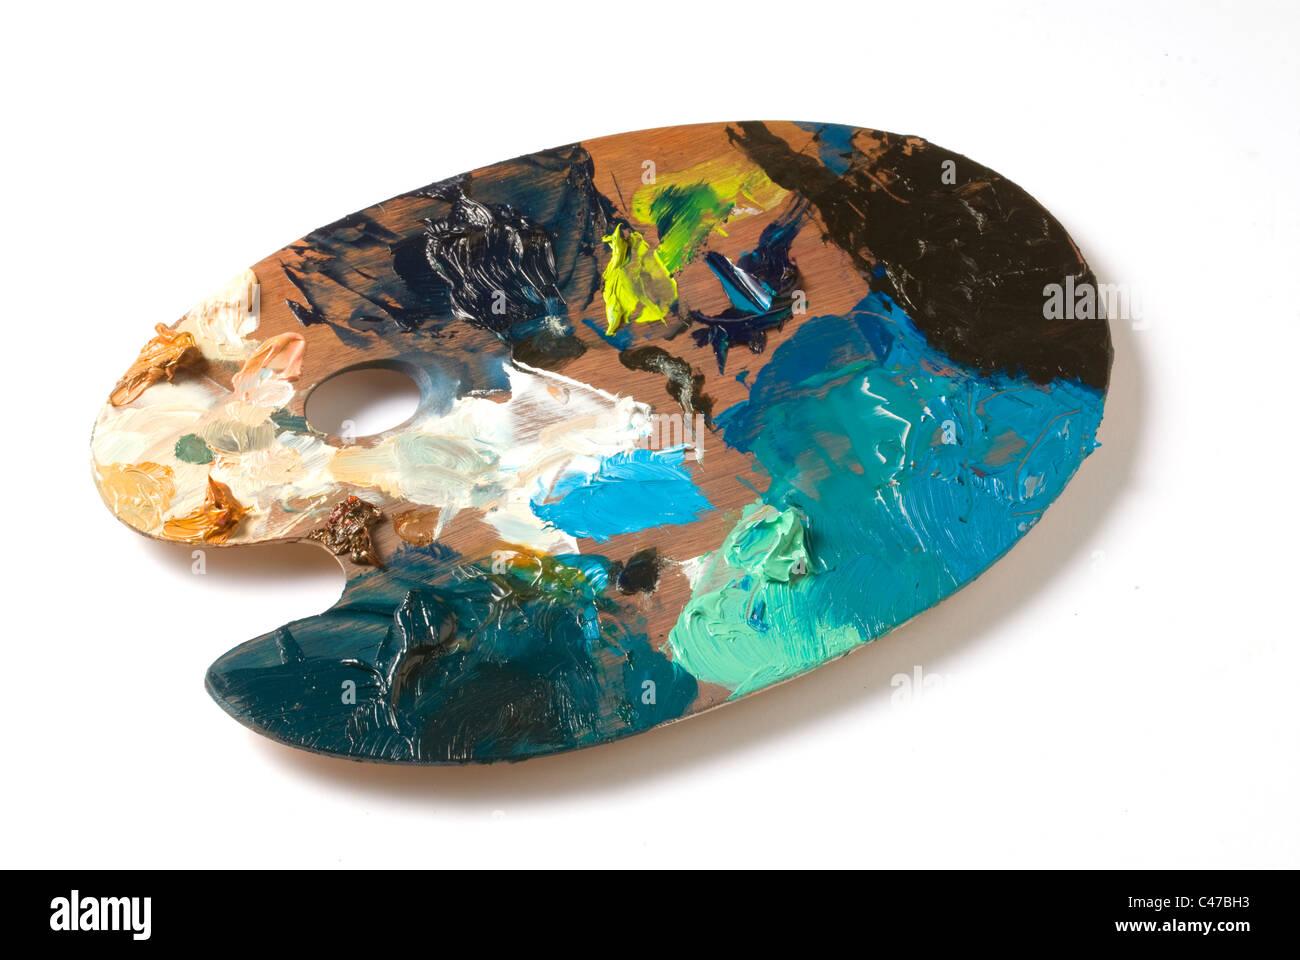 Artist's thin wooden paint palette - Stock Image